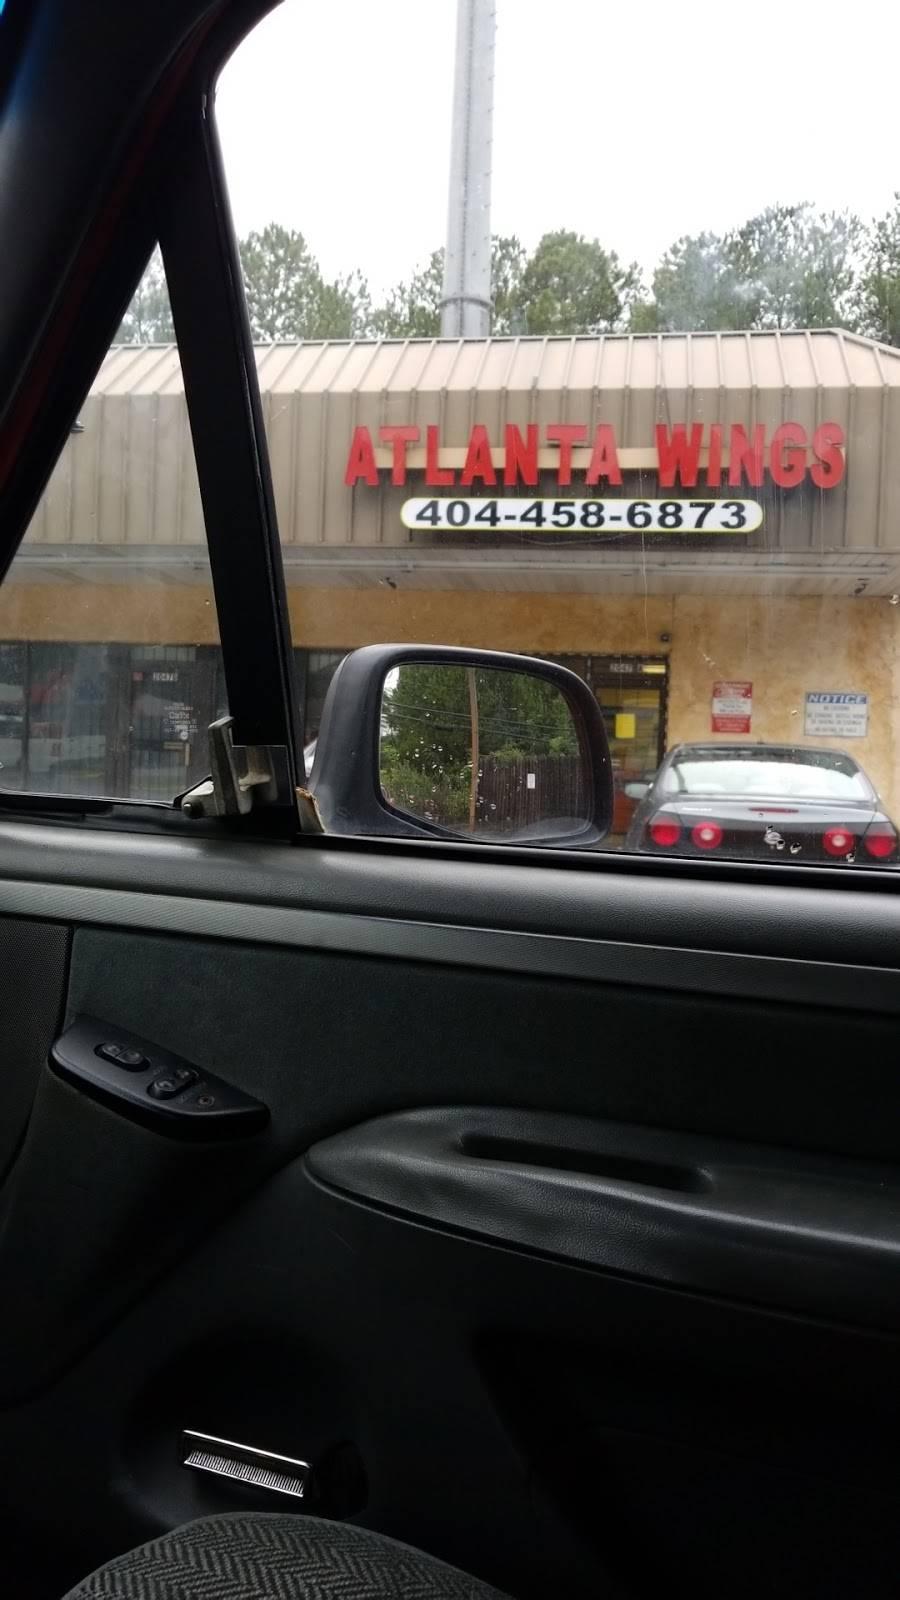 Atlanta Wings 2 | restaurant | 2047 Stanton Rd, Atlanta, GA 30344, USA | 4044586873 OR +1 404-458-6873